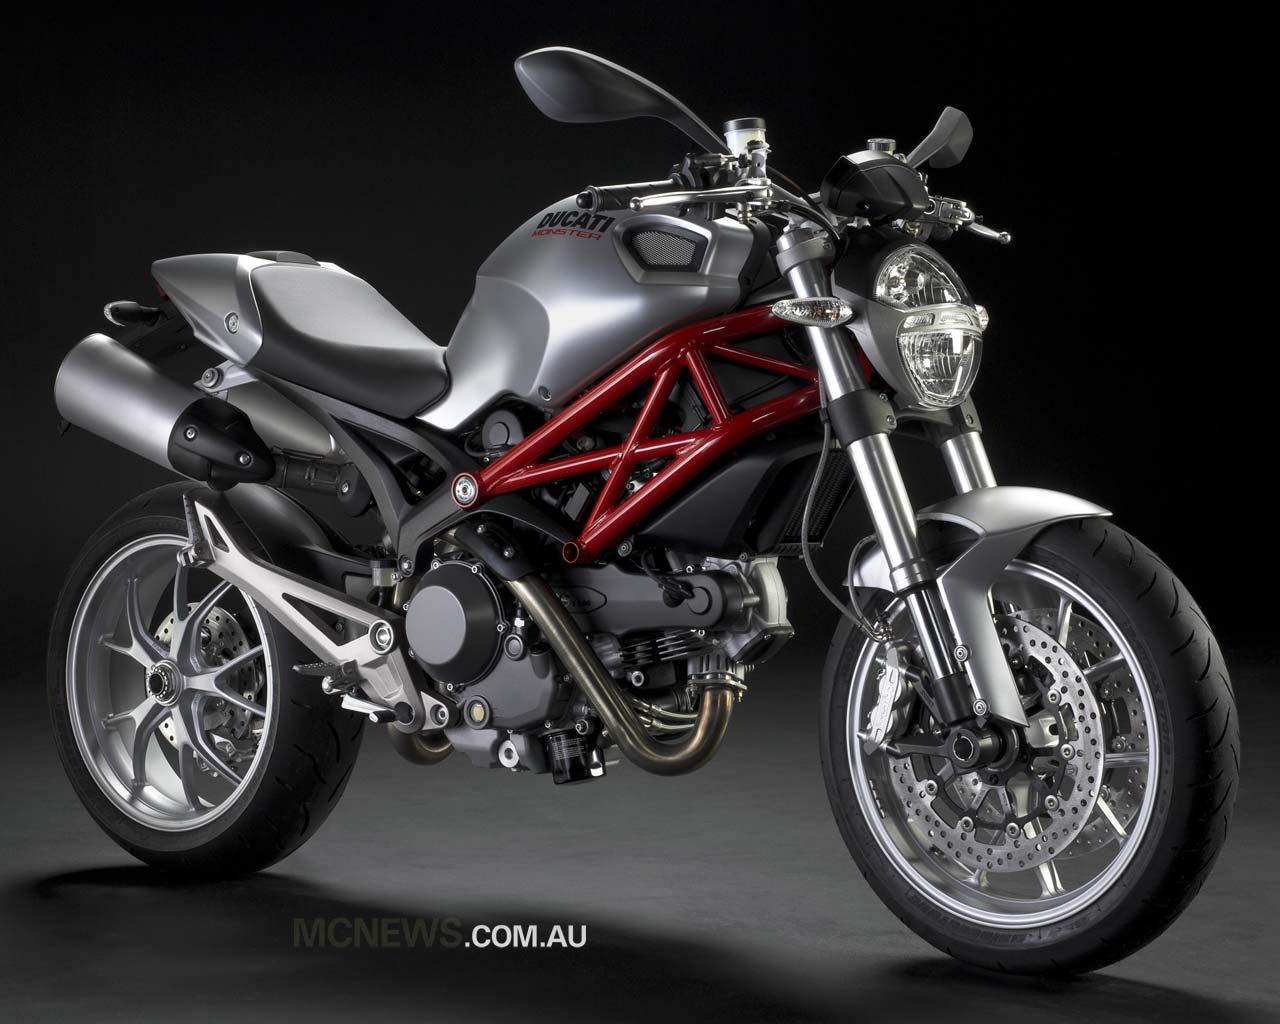 Moto Mania York Ducati Monster 1100s Fotos